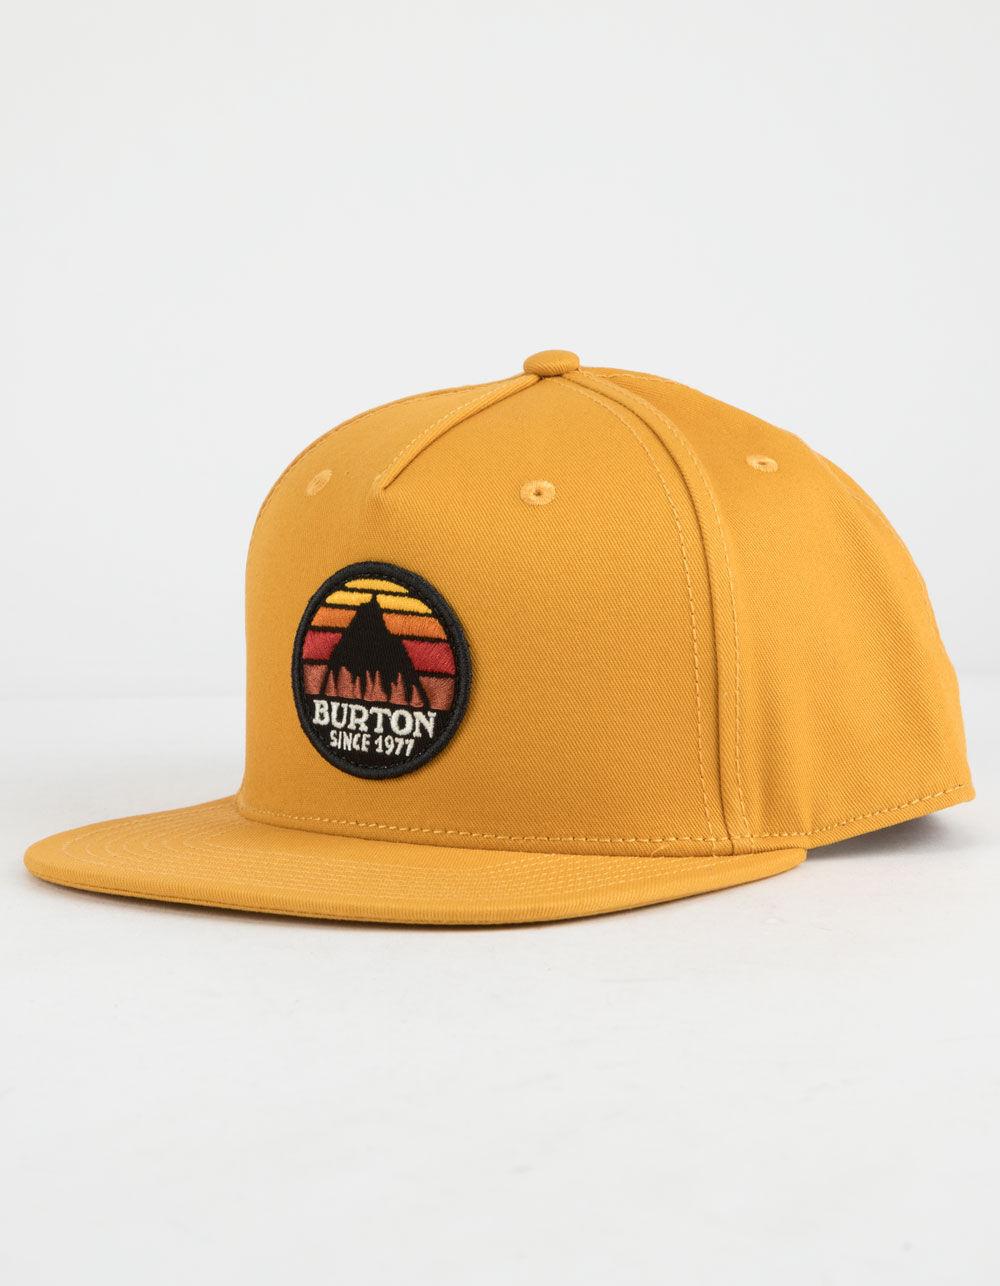 Image of BURTON UNDERHILL YELLOW SNAPBACK HAT